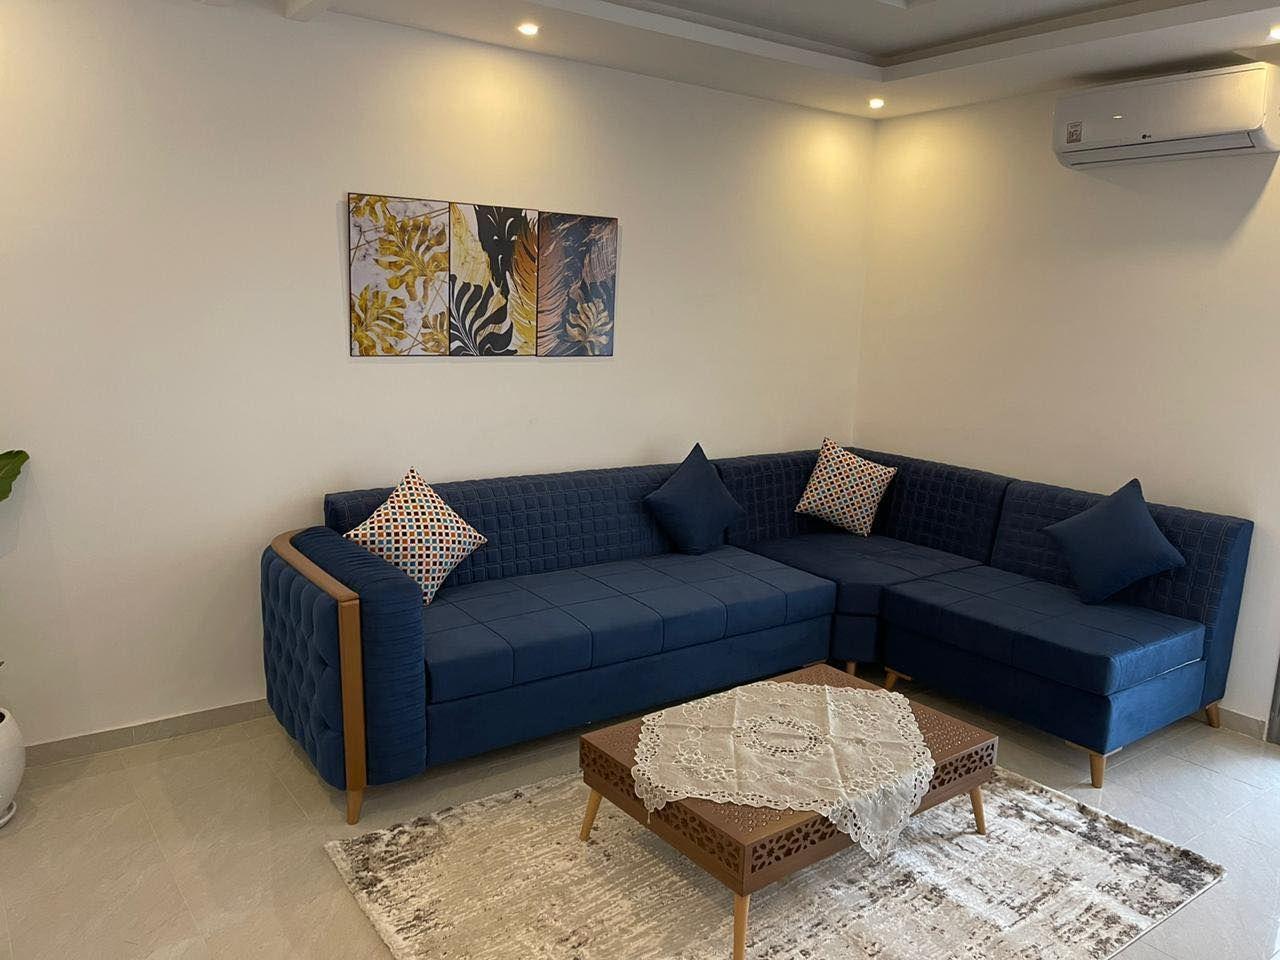 Location appartement fabio à hammamet